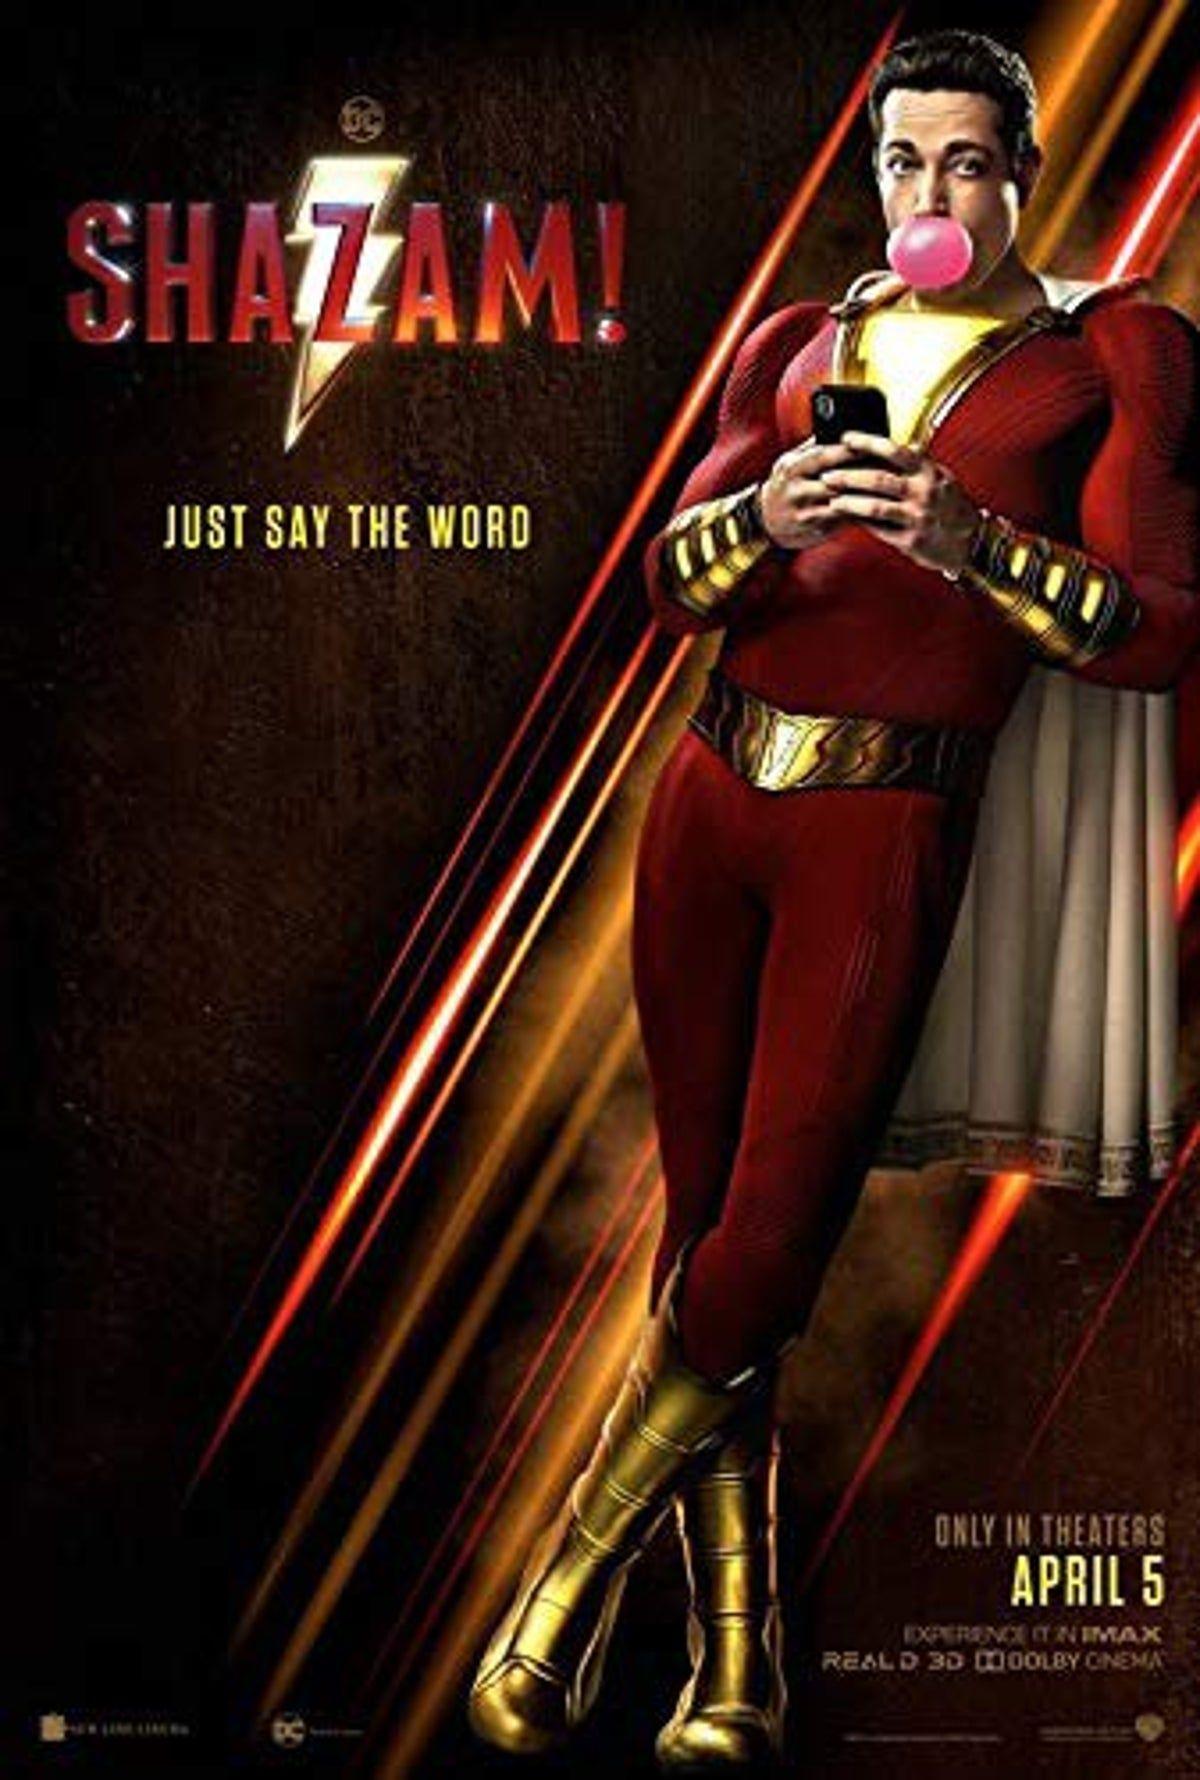 Coming to America Movie Poster Photo Print 8x10 11x17 16x20 22x28 24x36 27x40